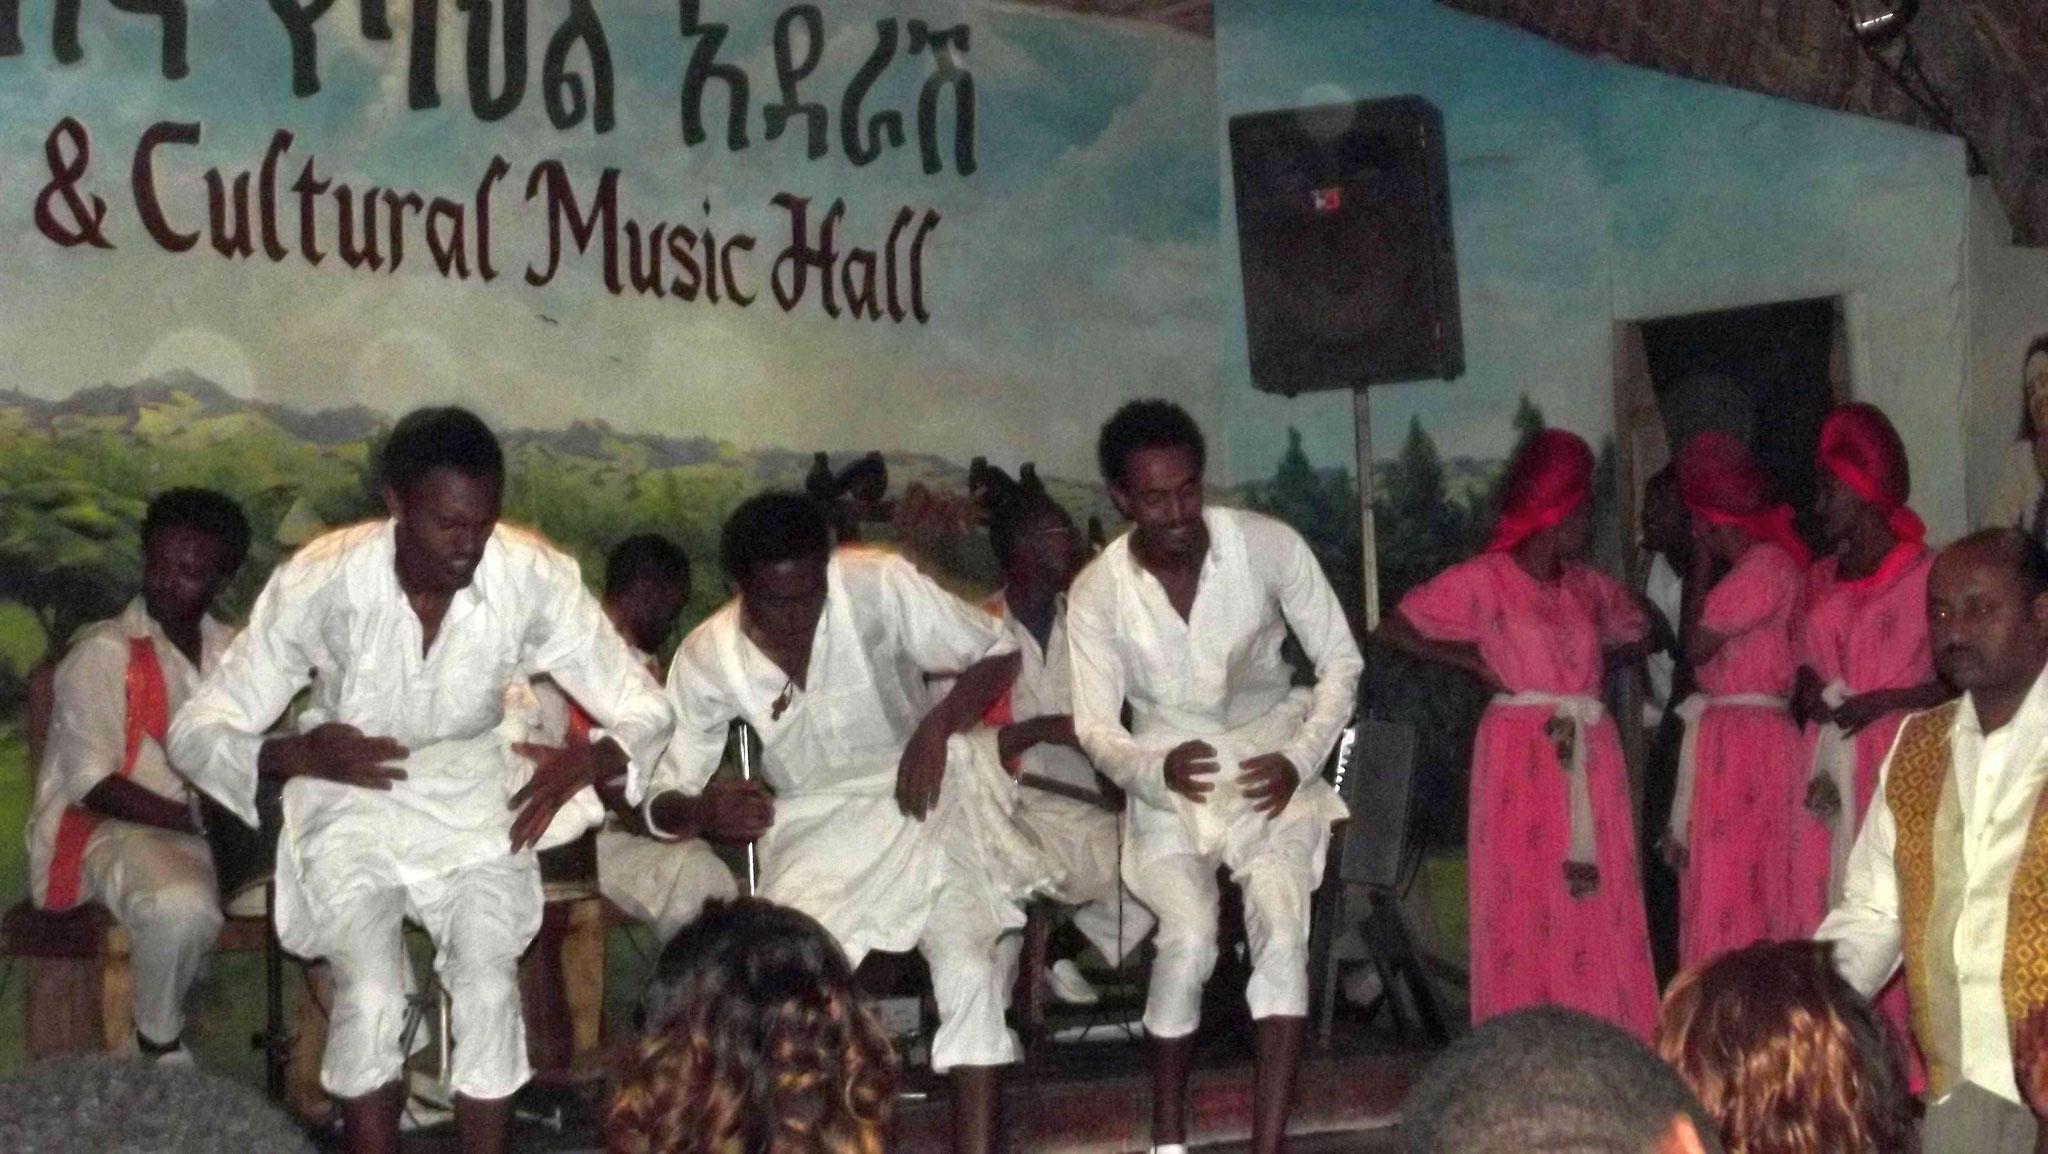 Danseurs éthiopiens de Dassalech